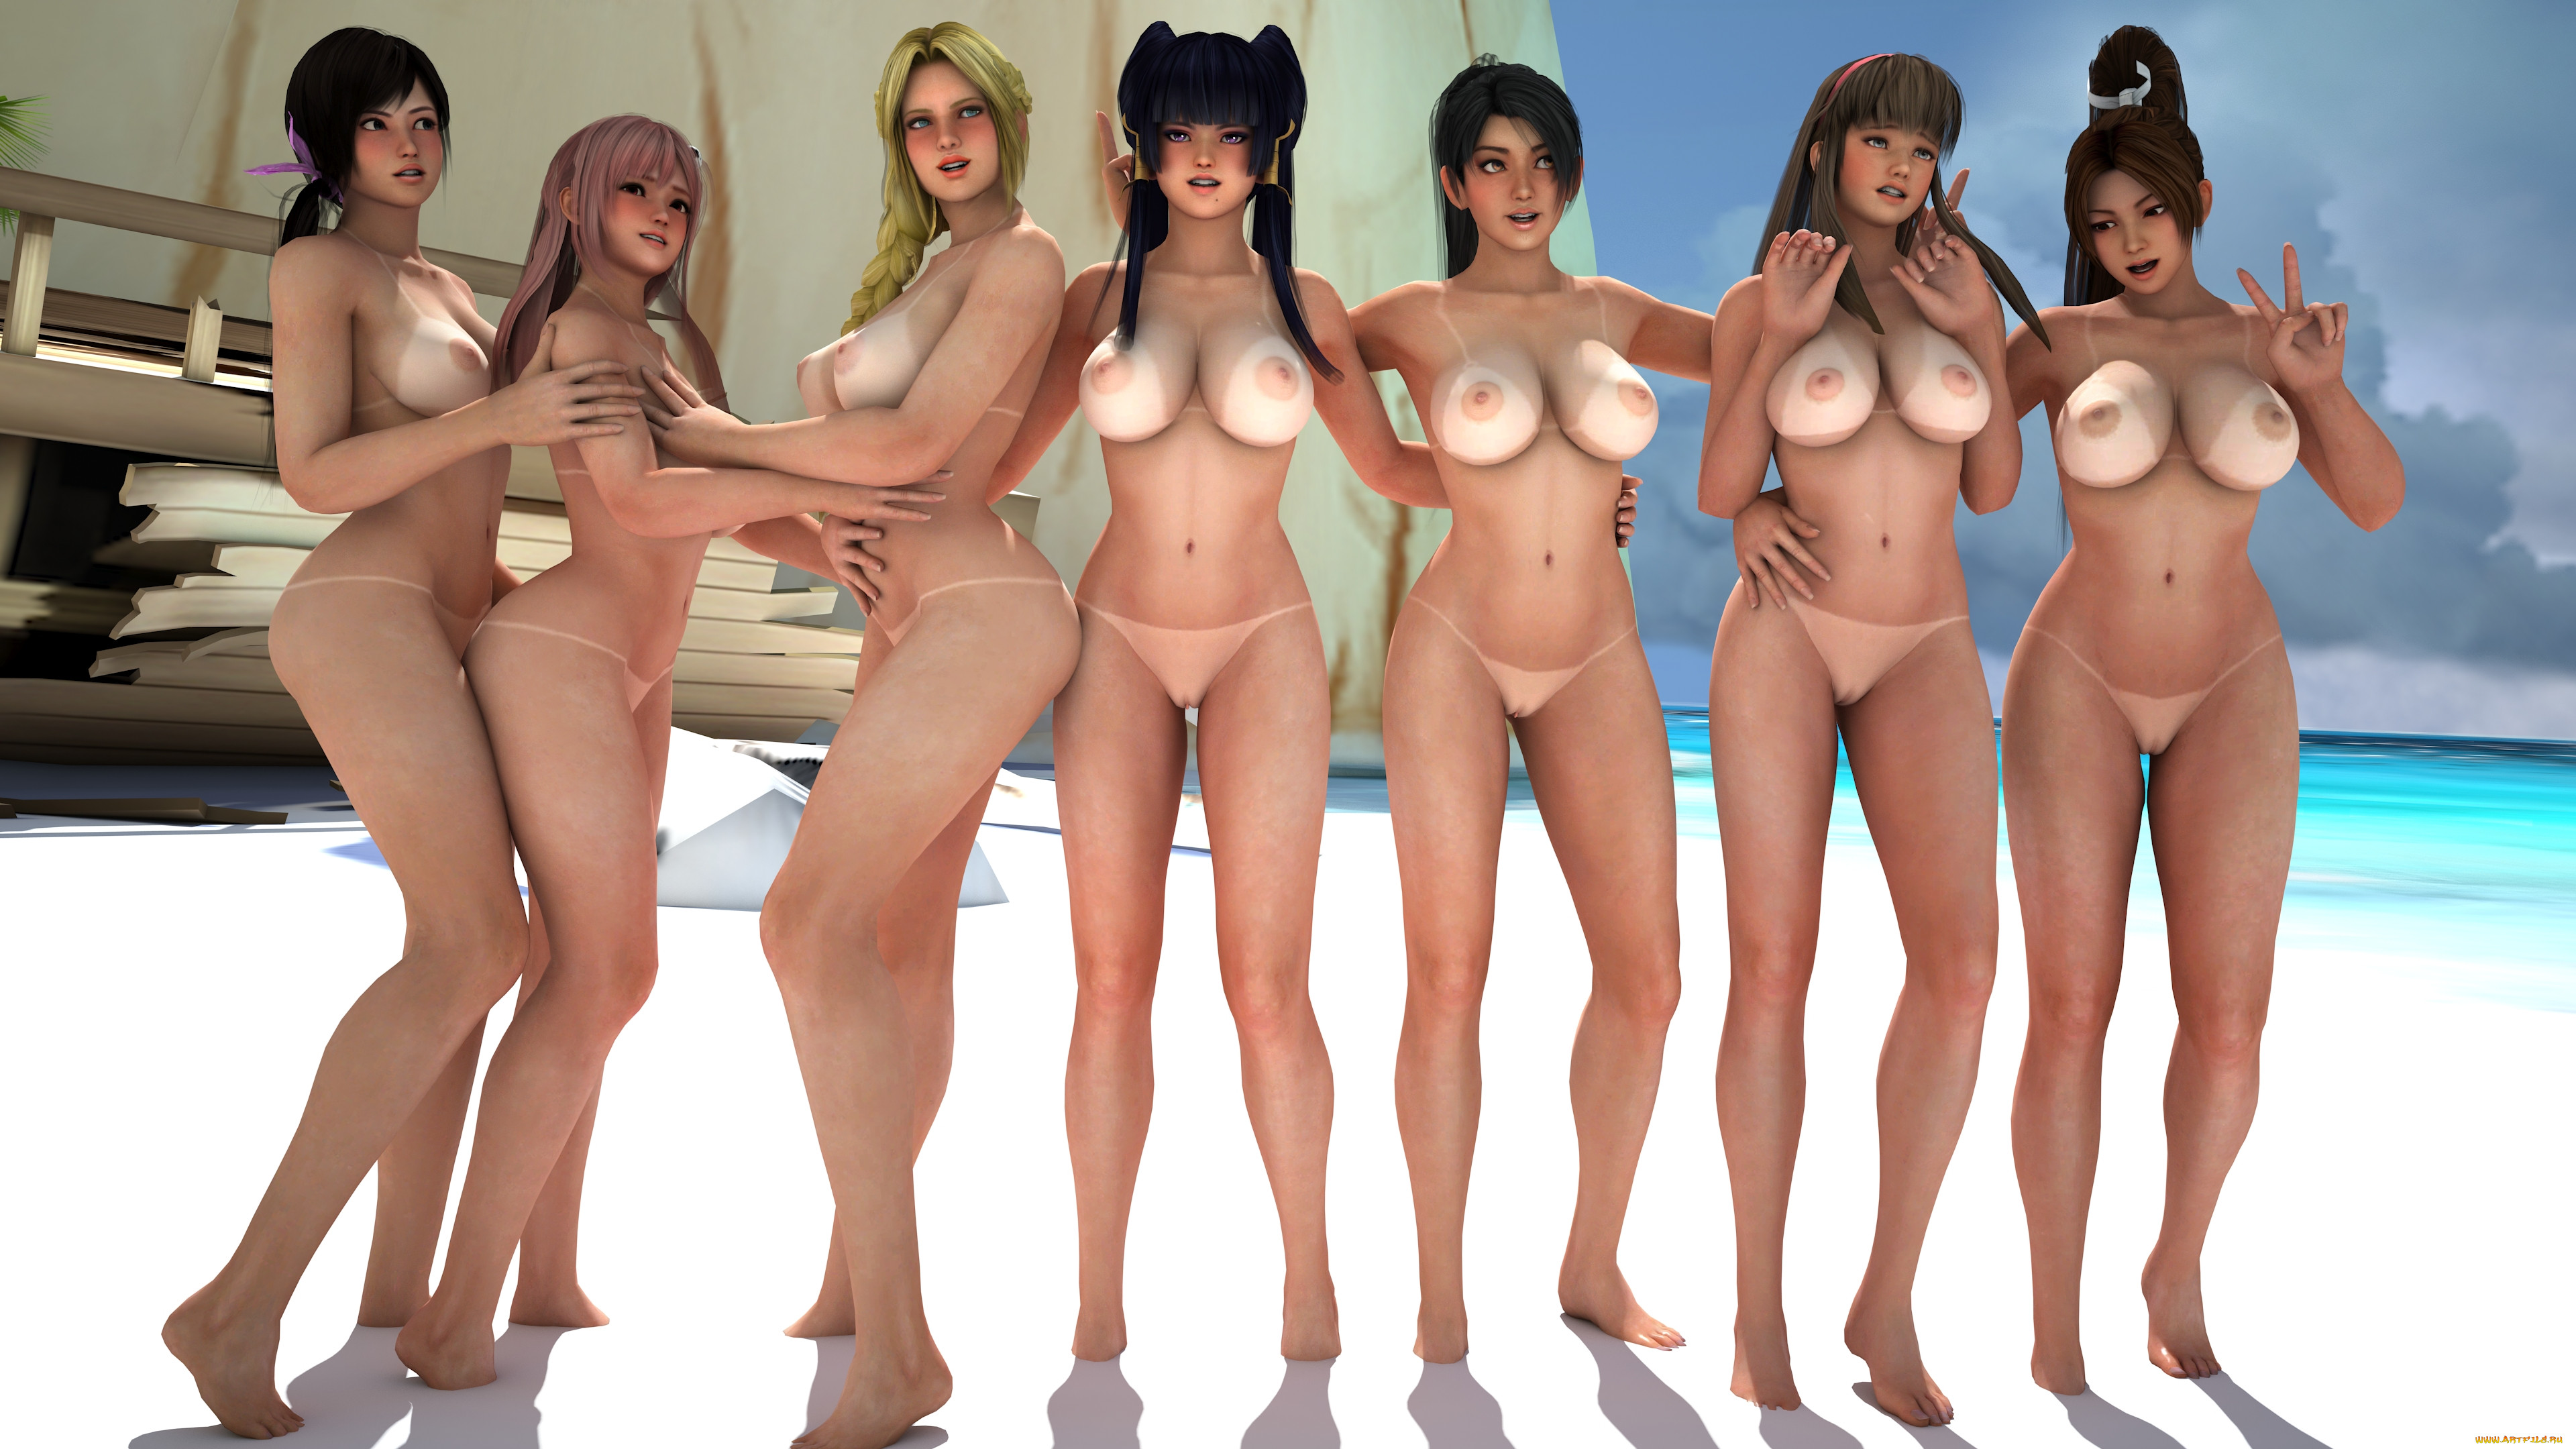 Boob mafia tgp, lesbian milfs with young girls